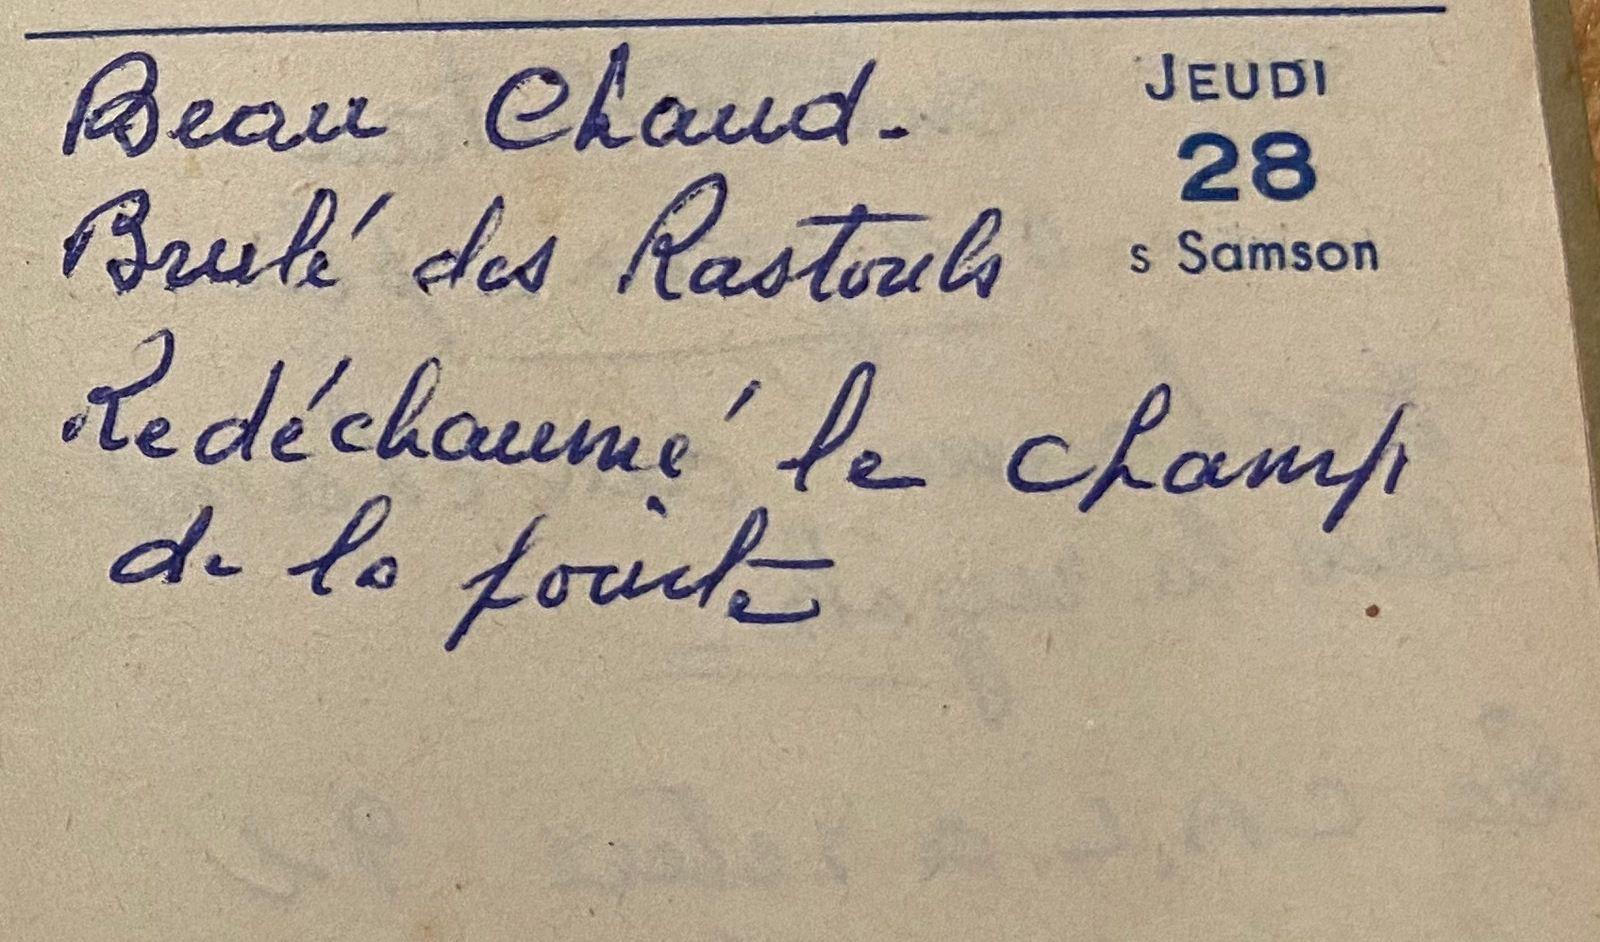 Jeudi 28 juillet 1960 - redéchaumer